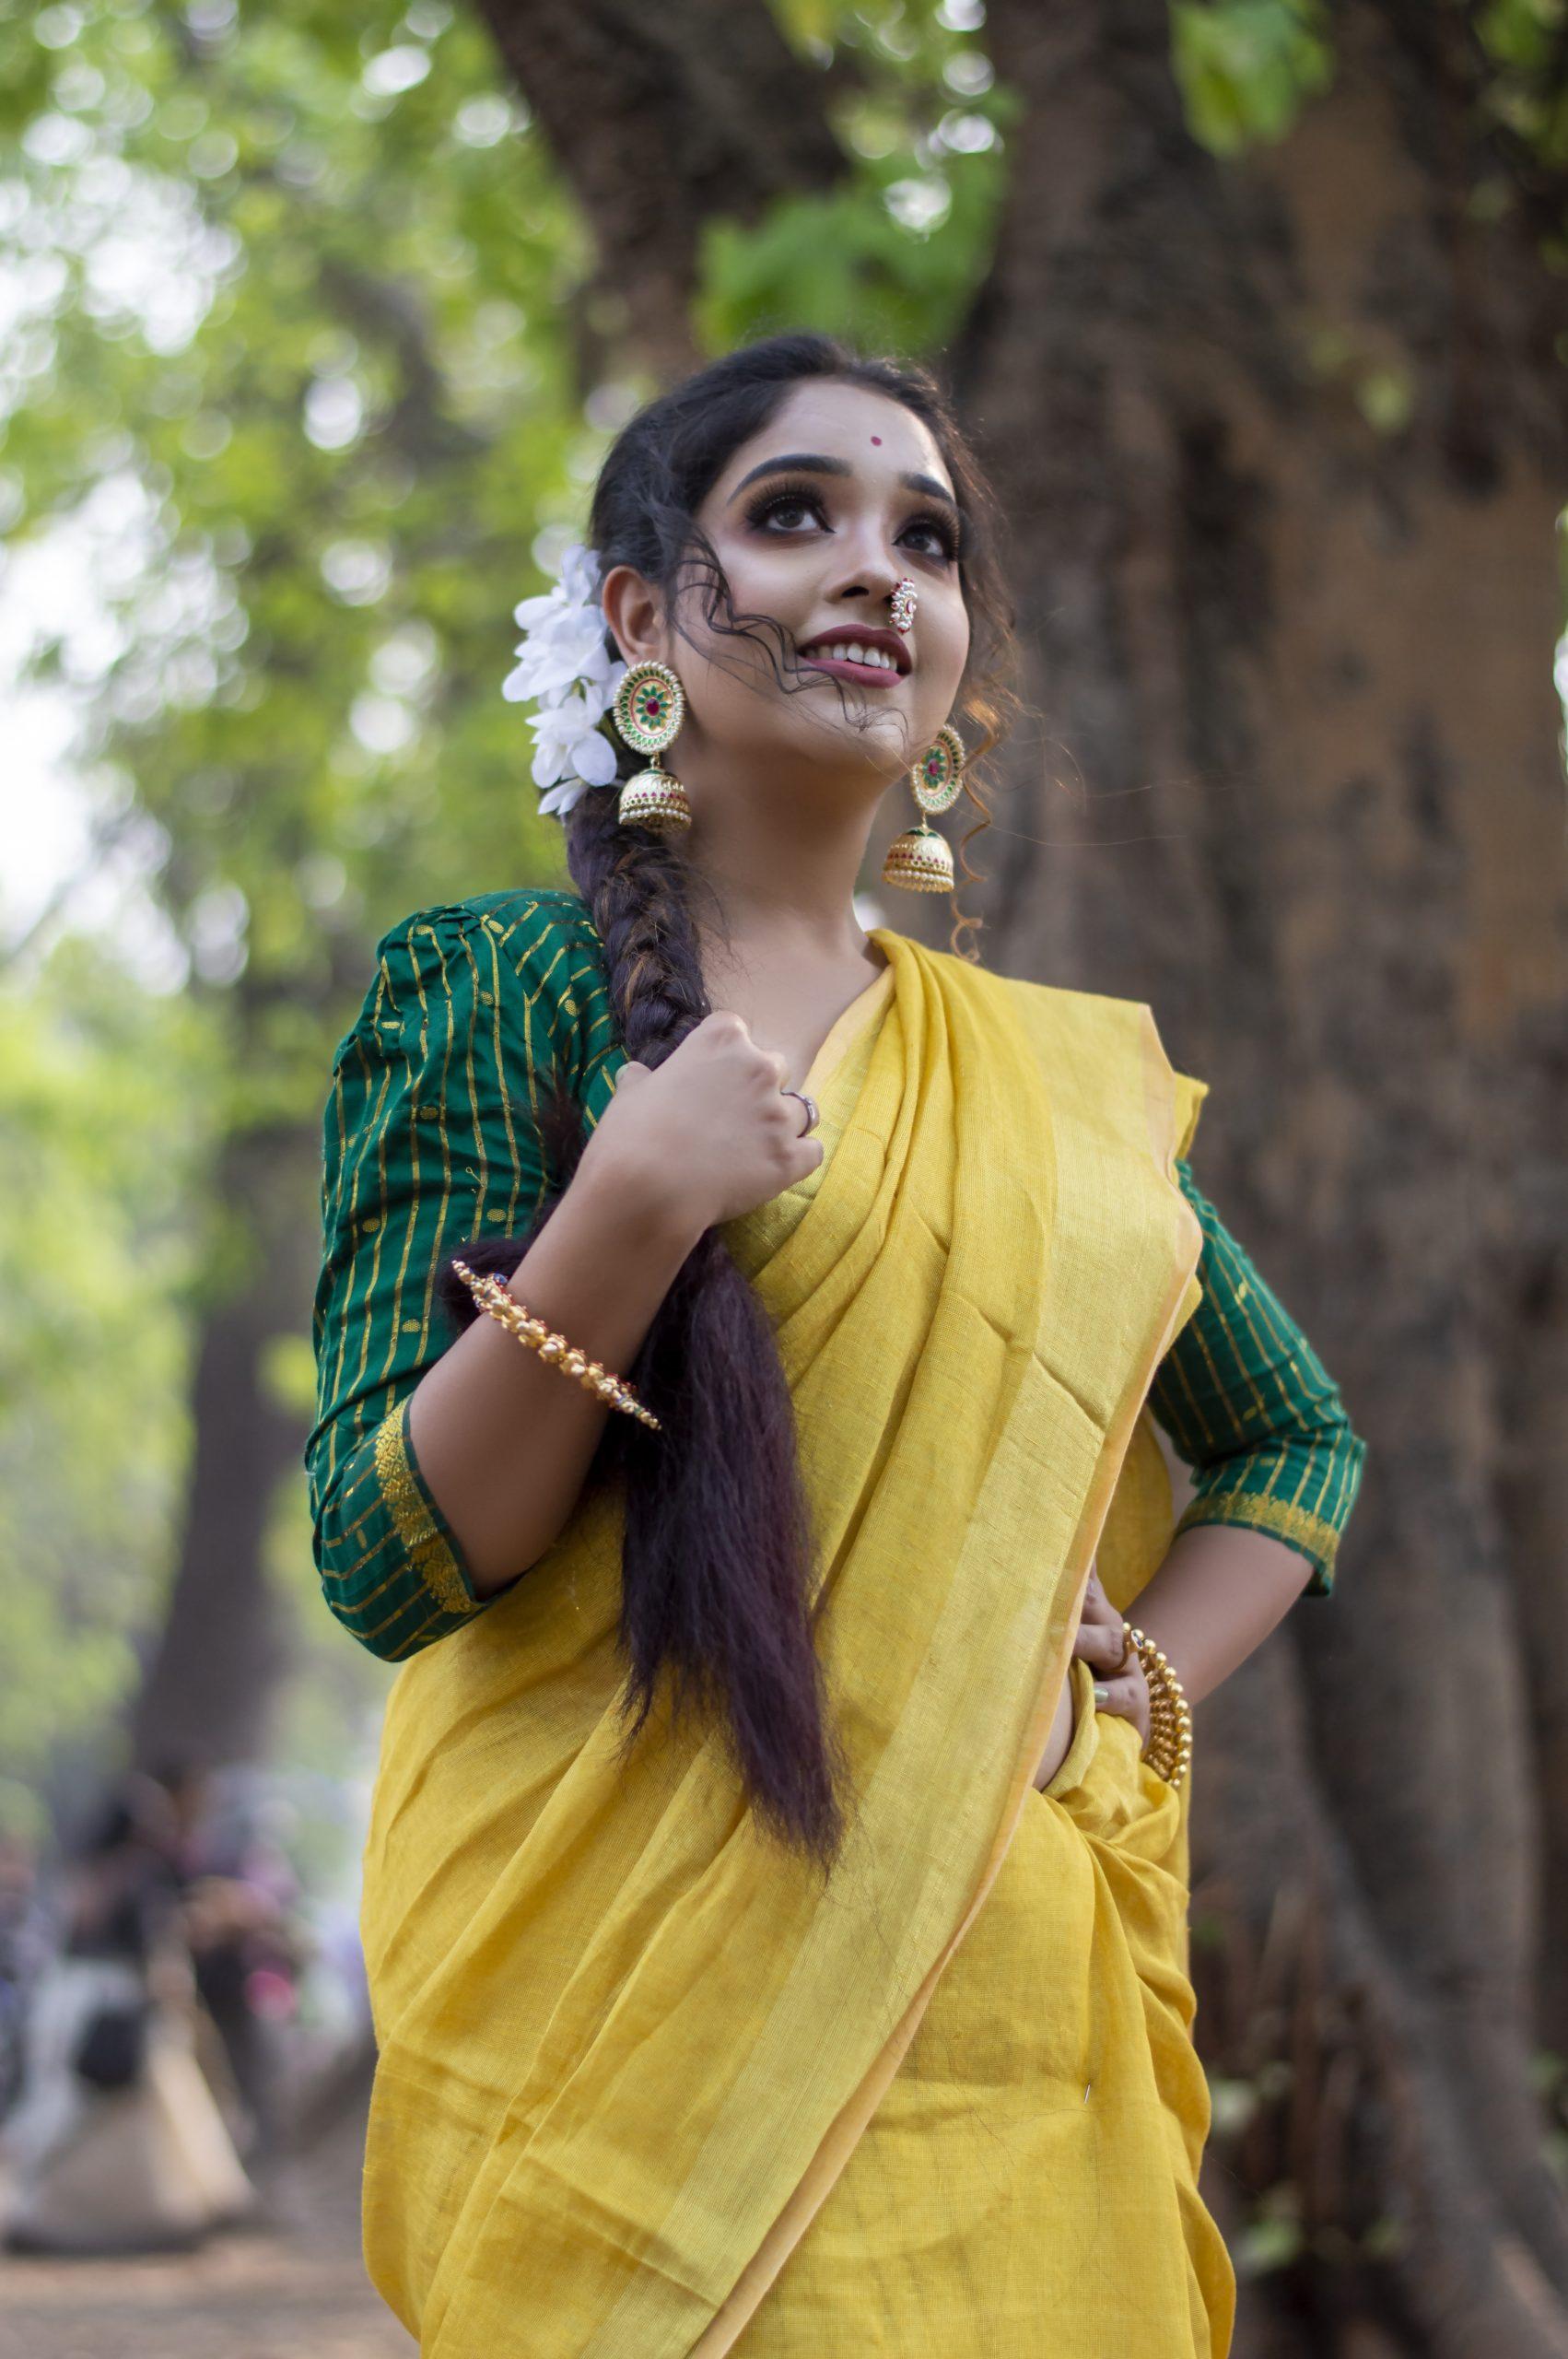 An Indian fashion model